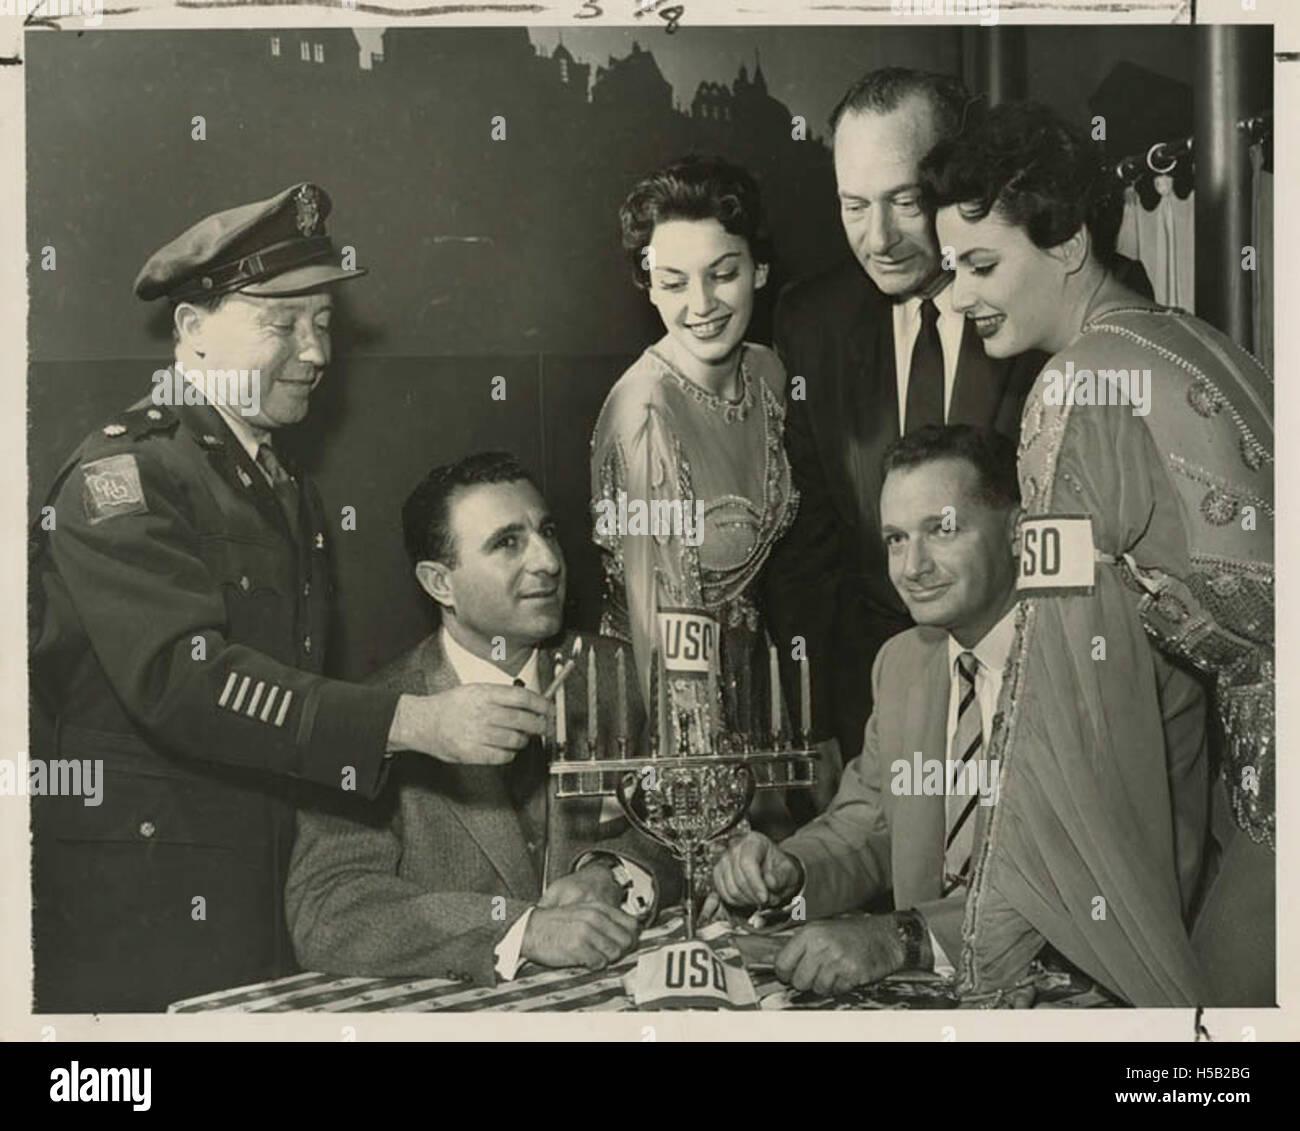 Chaplain Samuel W. Chomsky lights the traditional Hanukkah candles - Stock Image